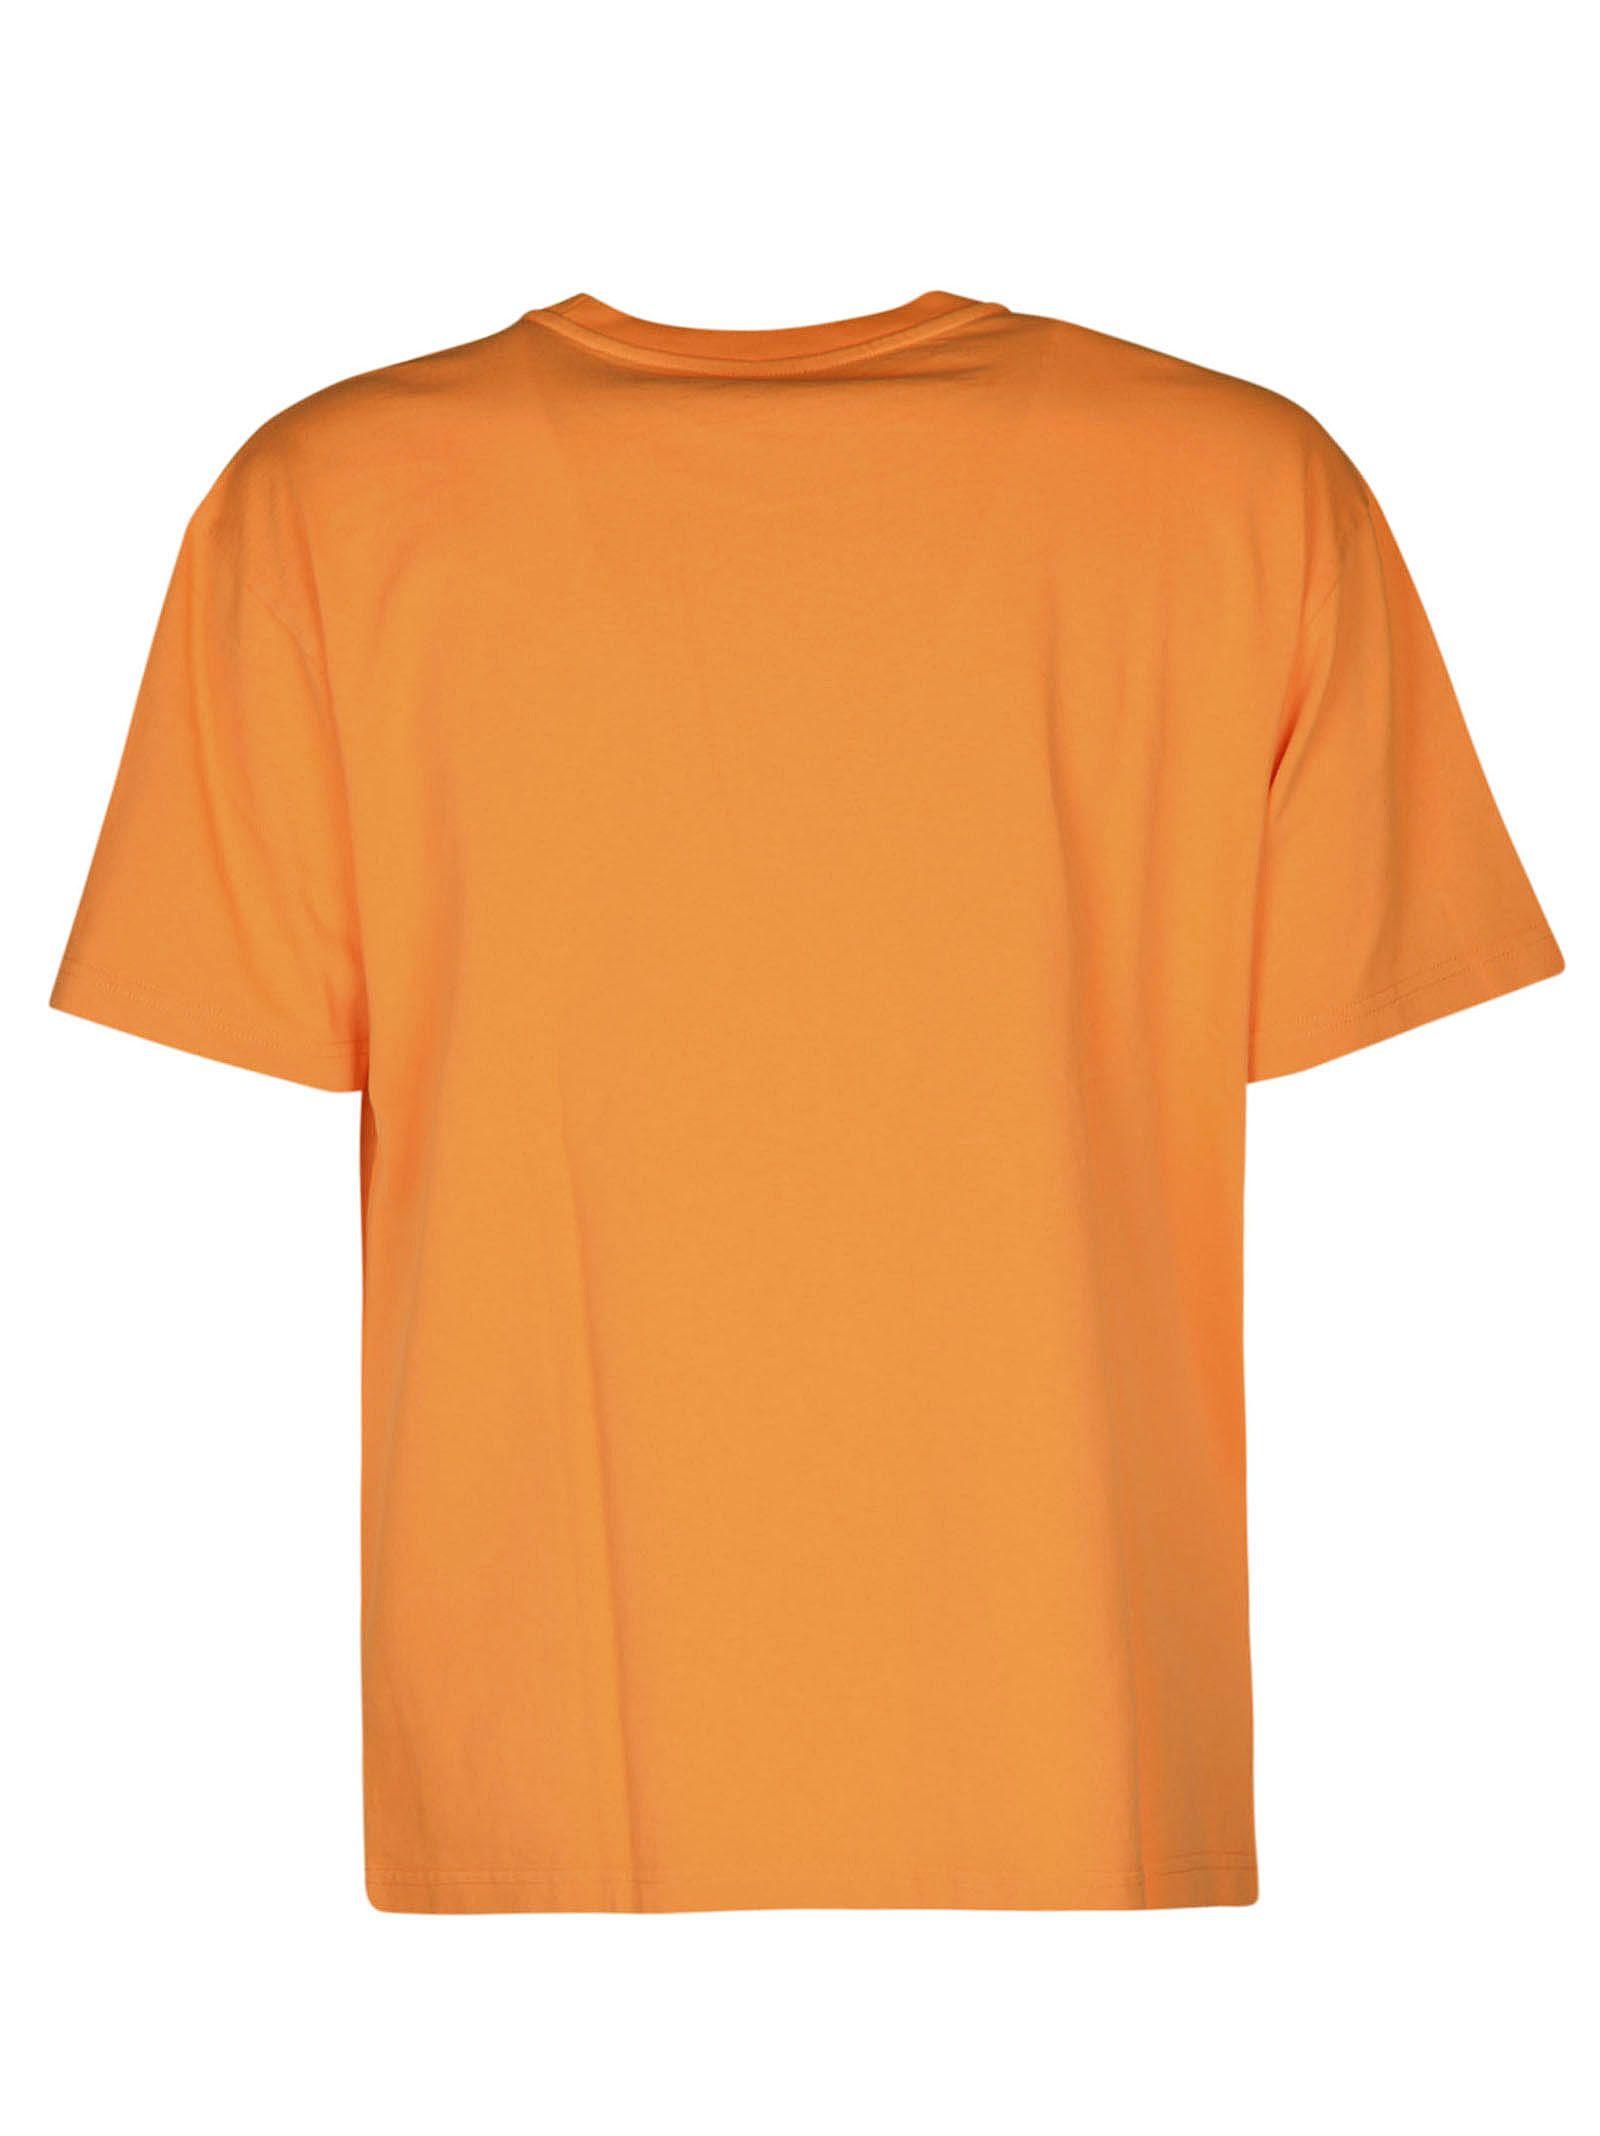 9e9fcd52 Kenzo Kenzo Neon Tiger T-shirt - Orange - 10854037   italist